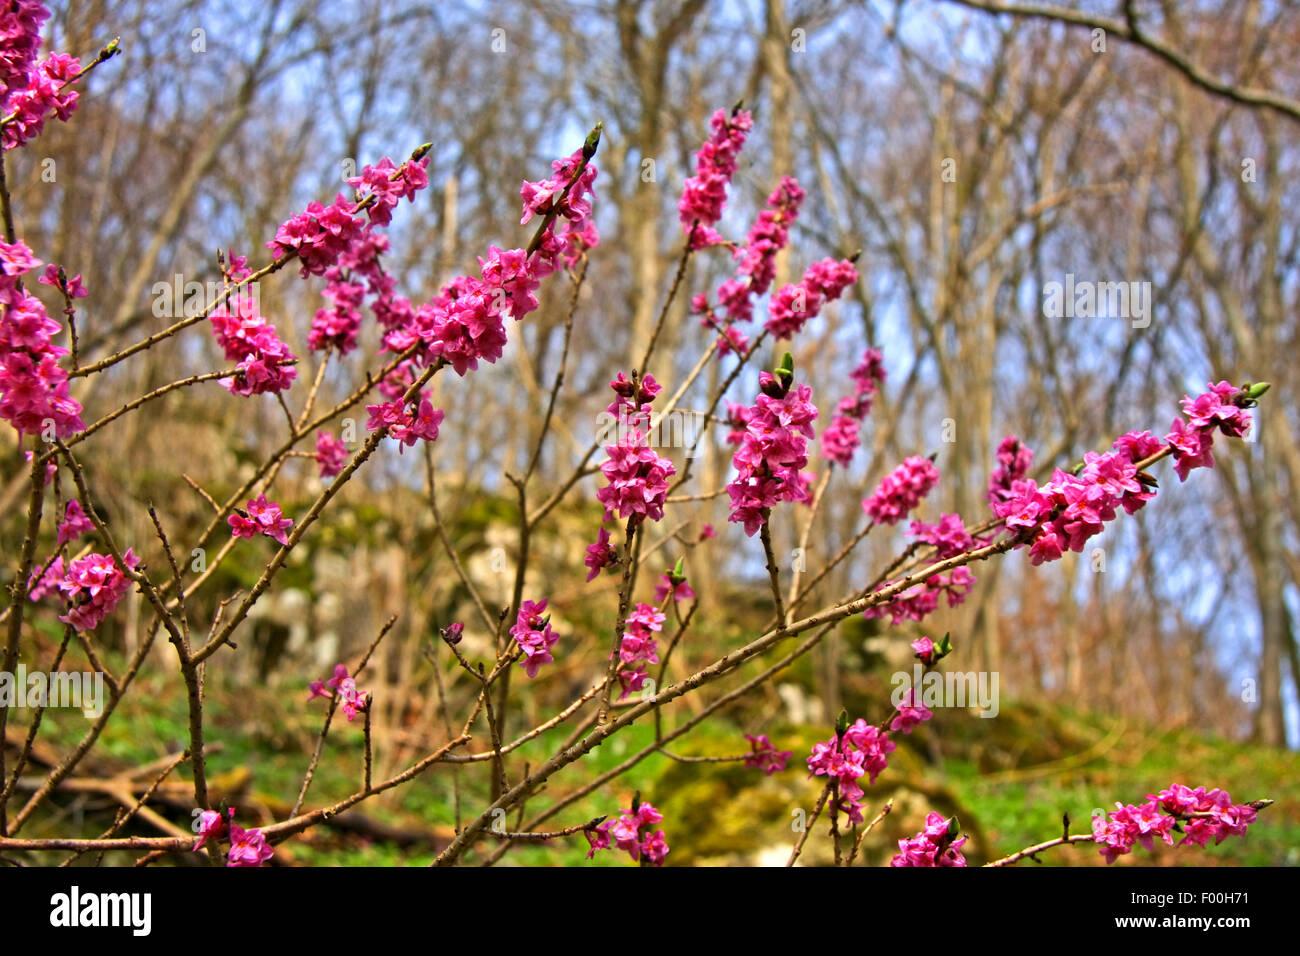 mezereon, February daphne (Daphne mezereum), blooming, Germany - Stock Image